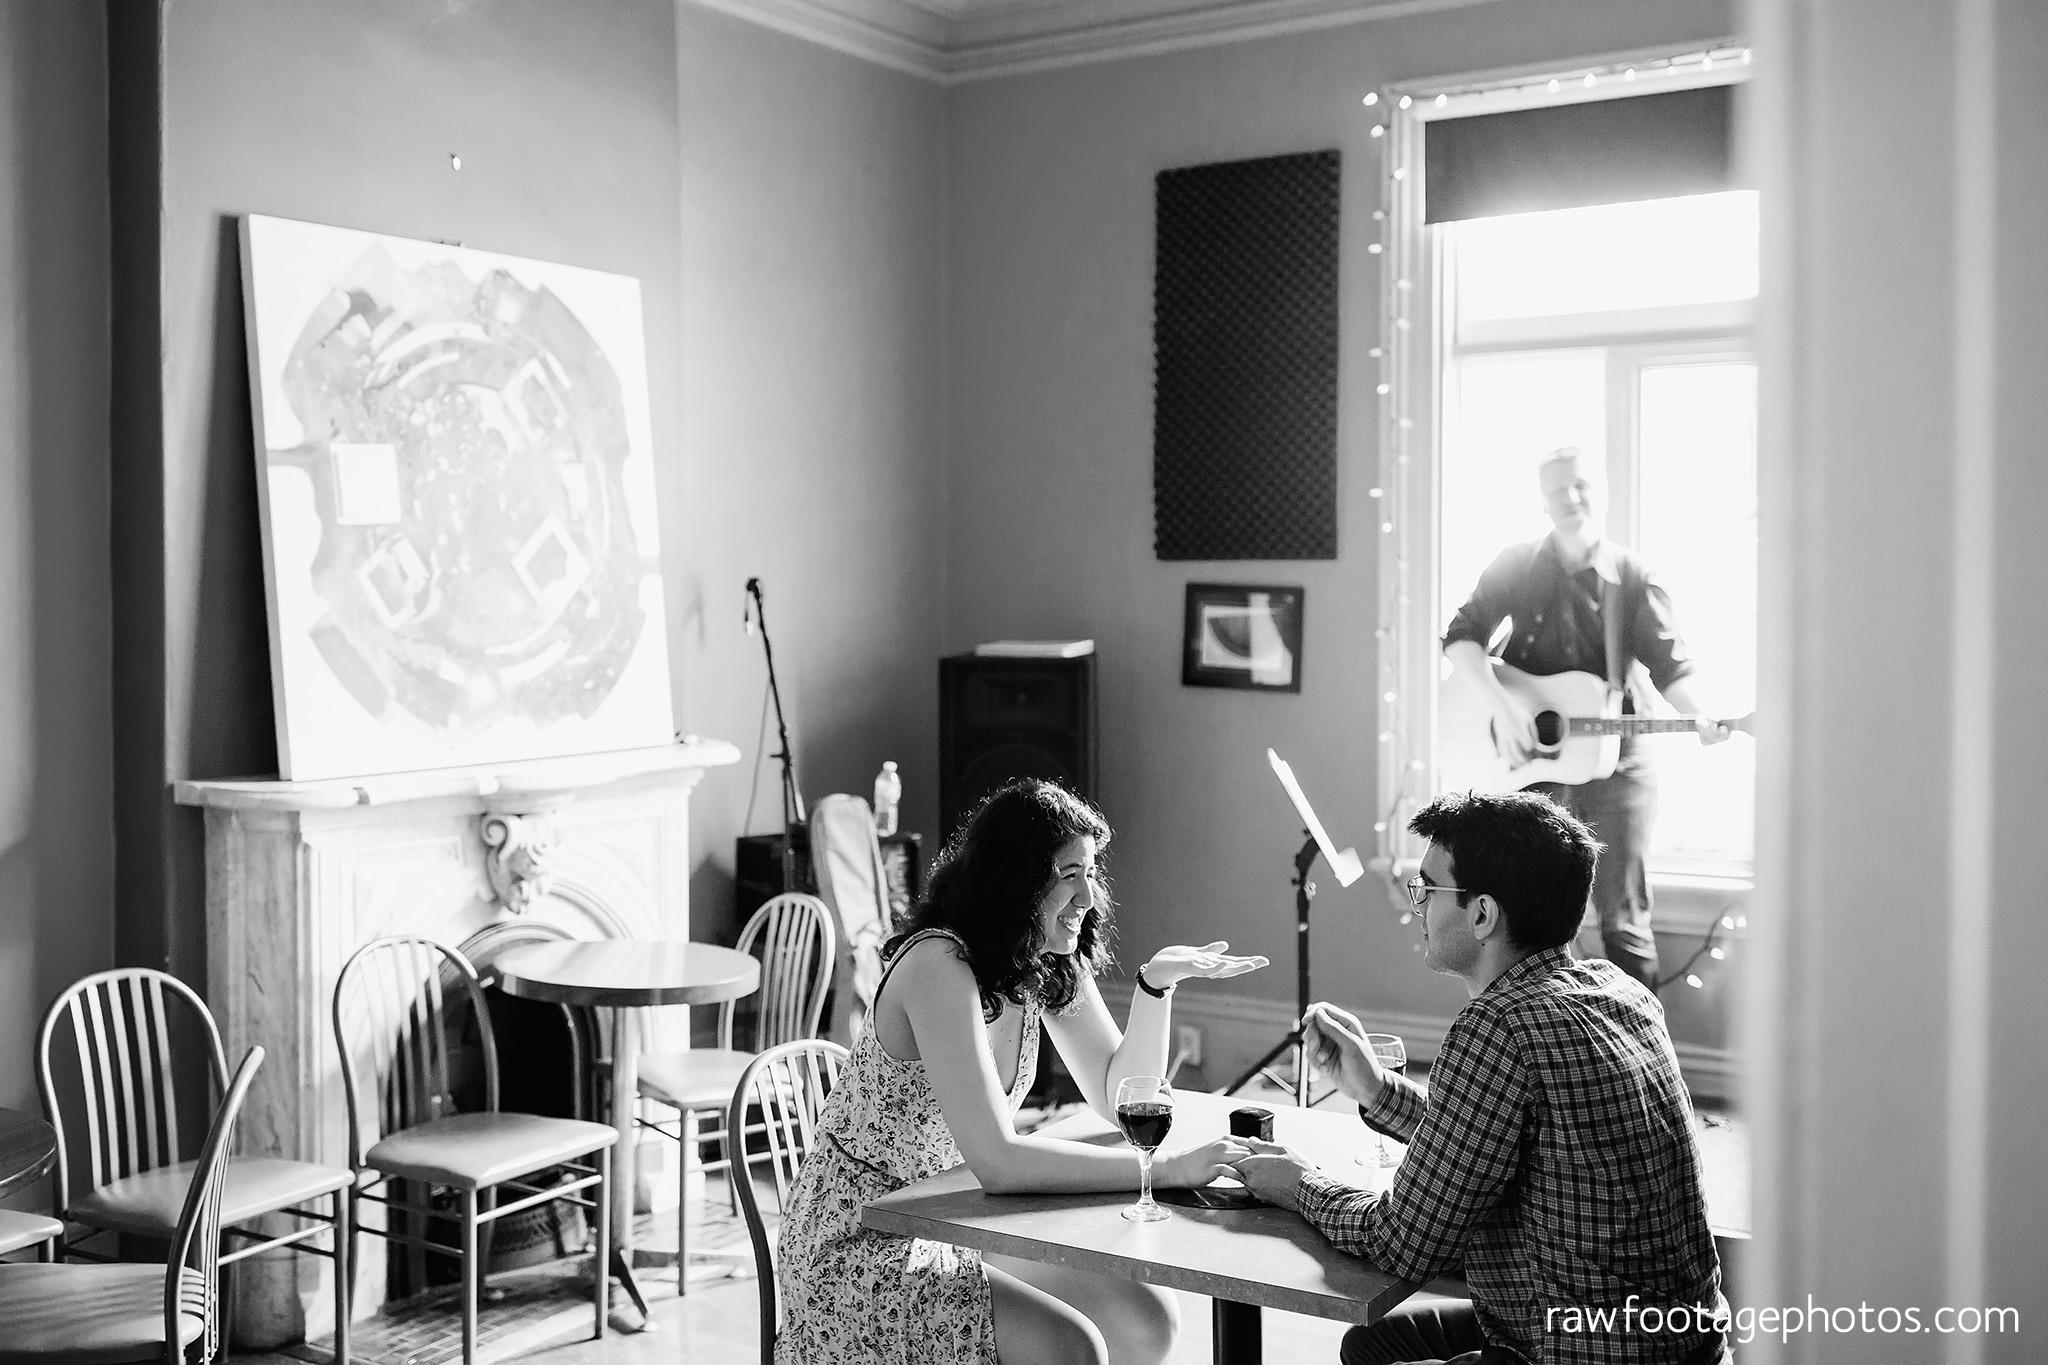 london_ontario_photographer-proposal_photographer-surprise_proposal-london_music_club-raw_footage_photography-wedding_photographer008.jpg